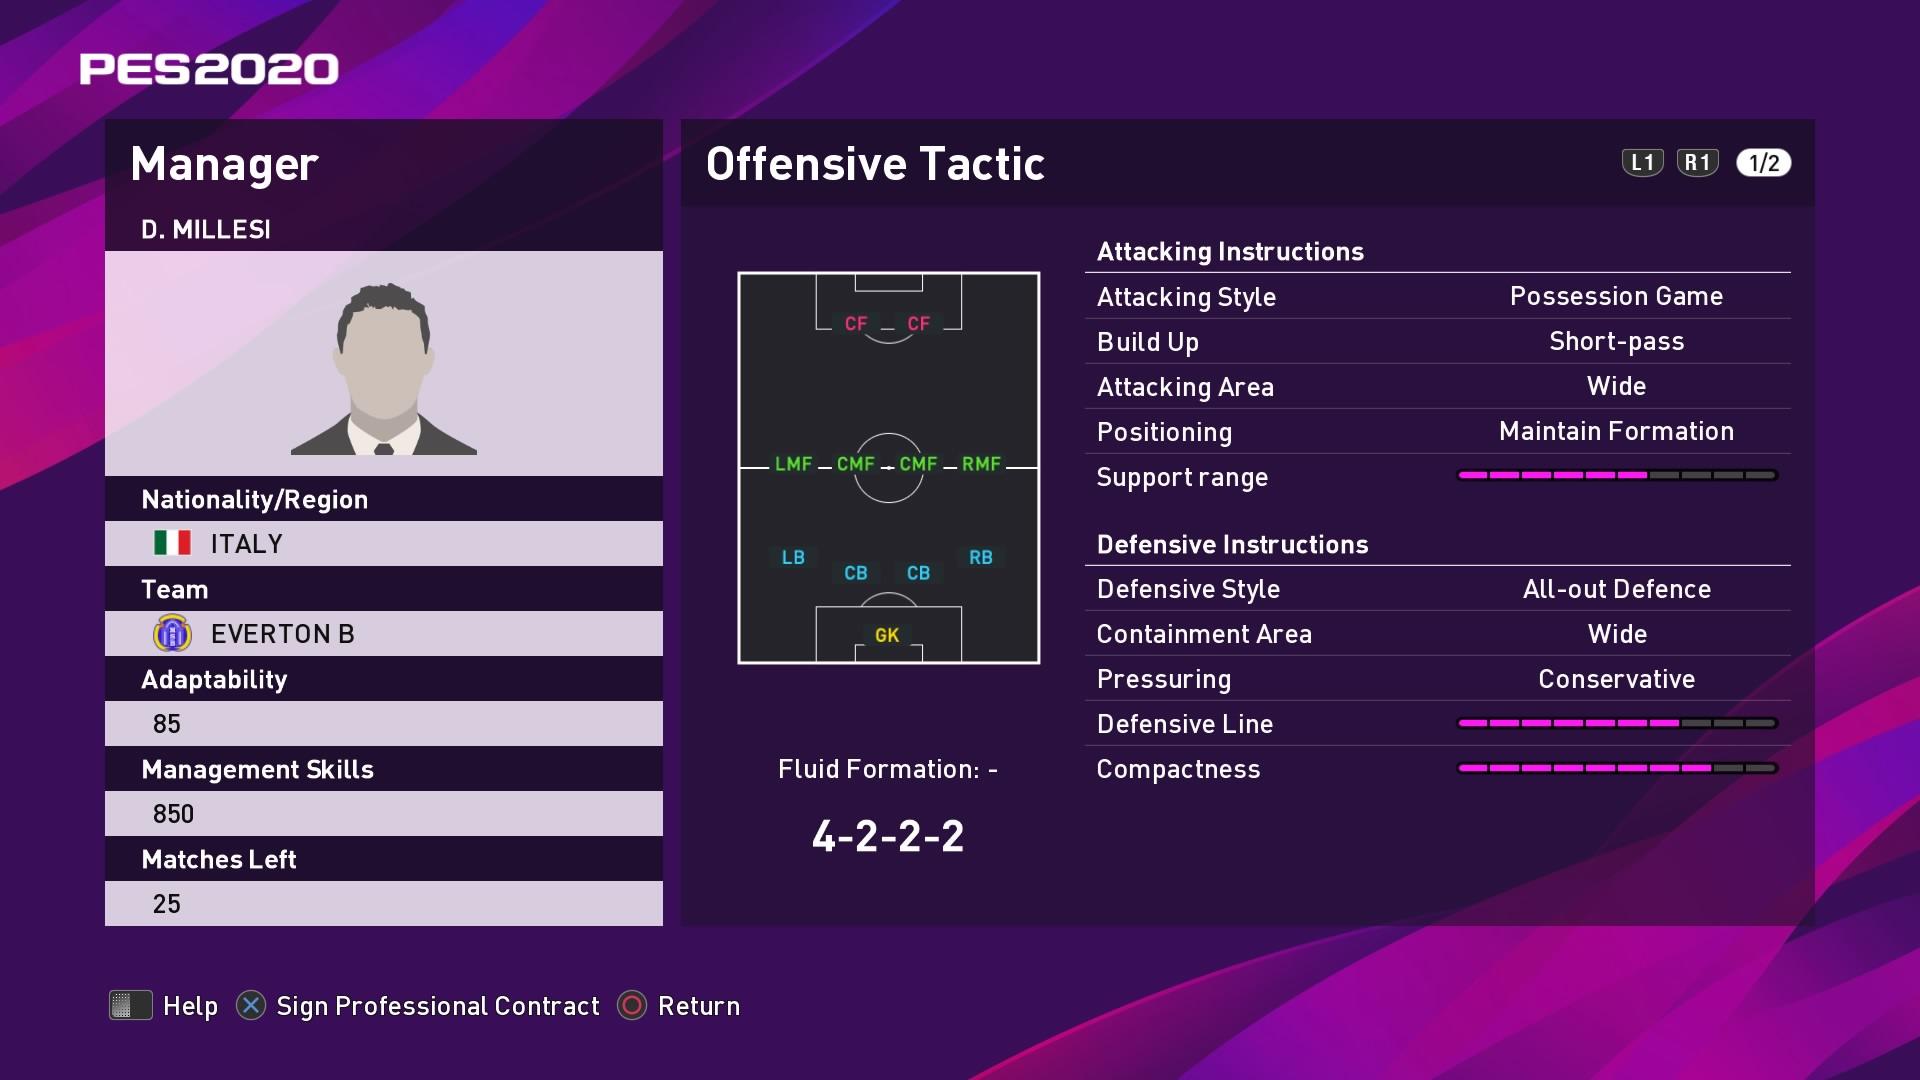 D. Millesi (3) (Carlo Ancelotti) Offensive Tactic in PES 2020 myClub